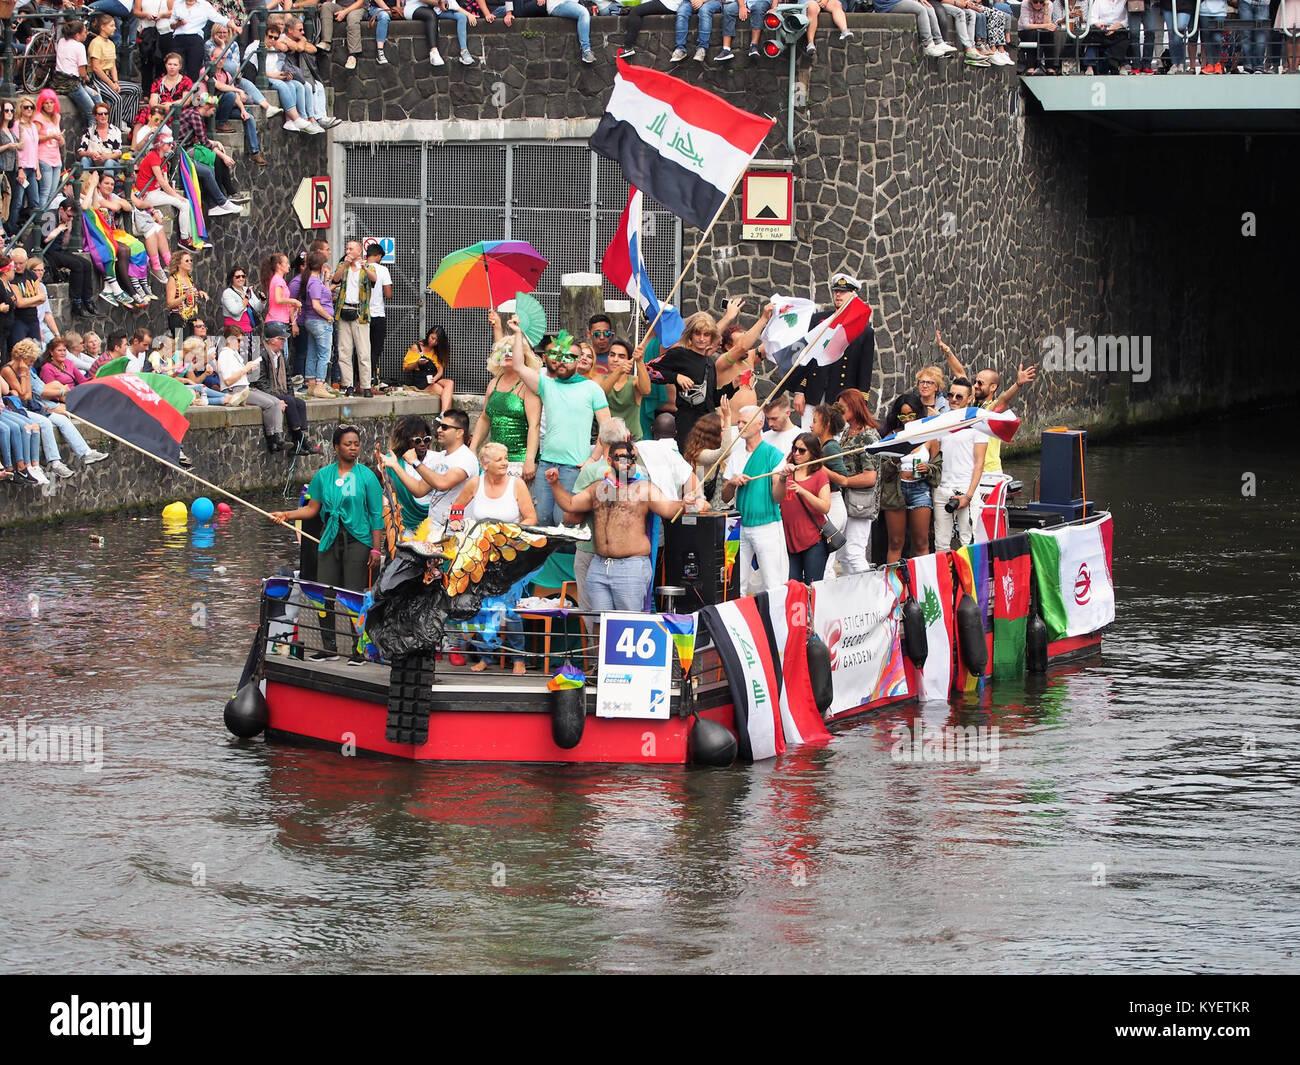 Boat 46 Stichting Secret Garden Canal Parade Amsterdam 2017 Foto 2